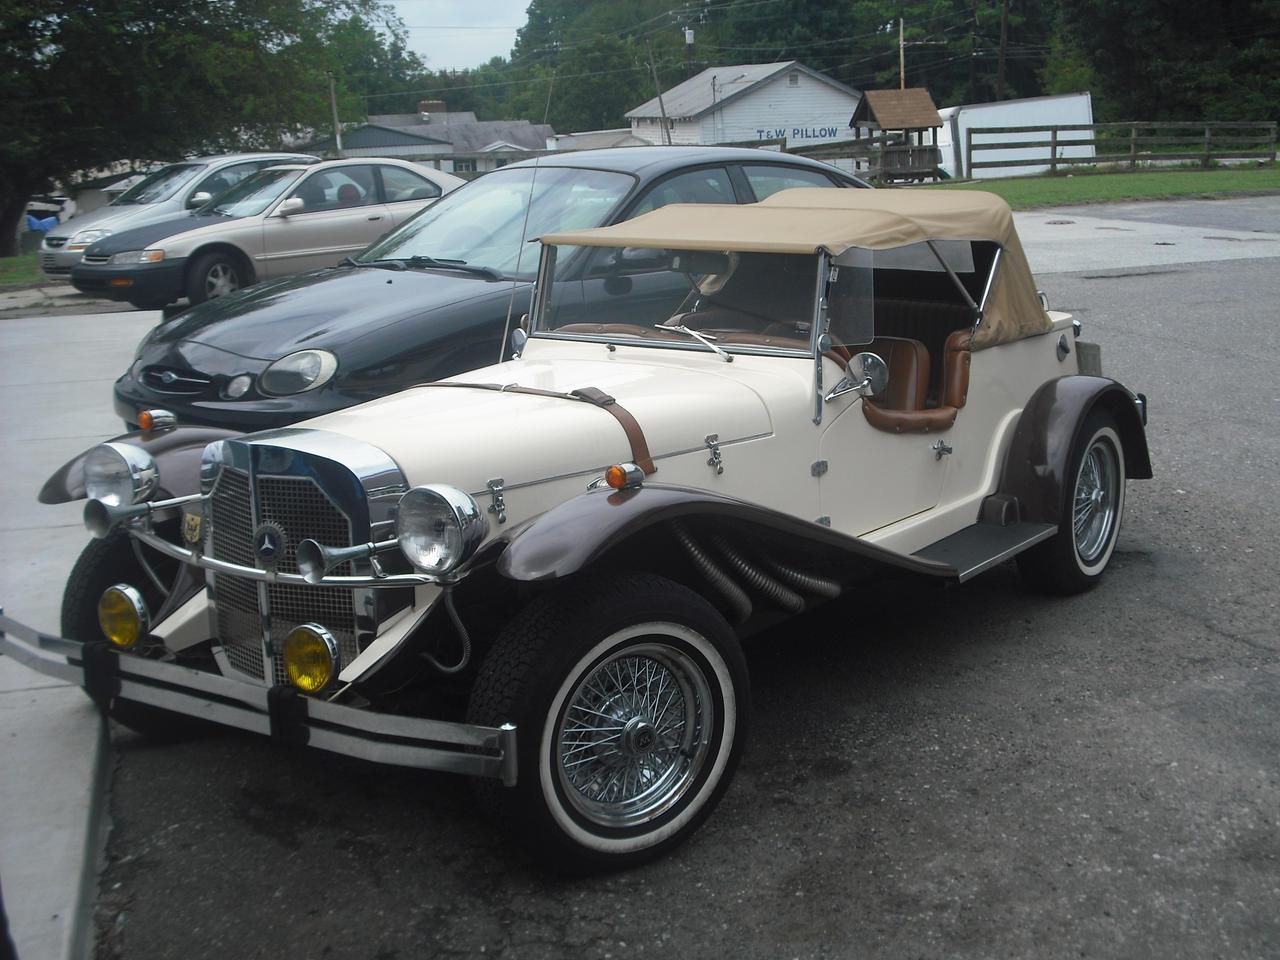 1929 mercedes benz by shadow55419 on deviantart for 1929 mercedes benz